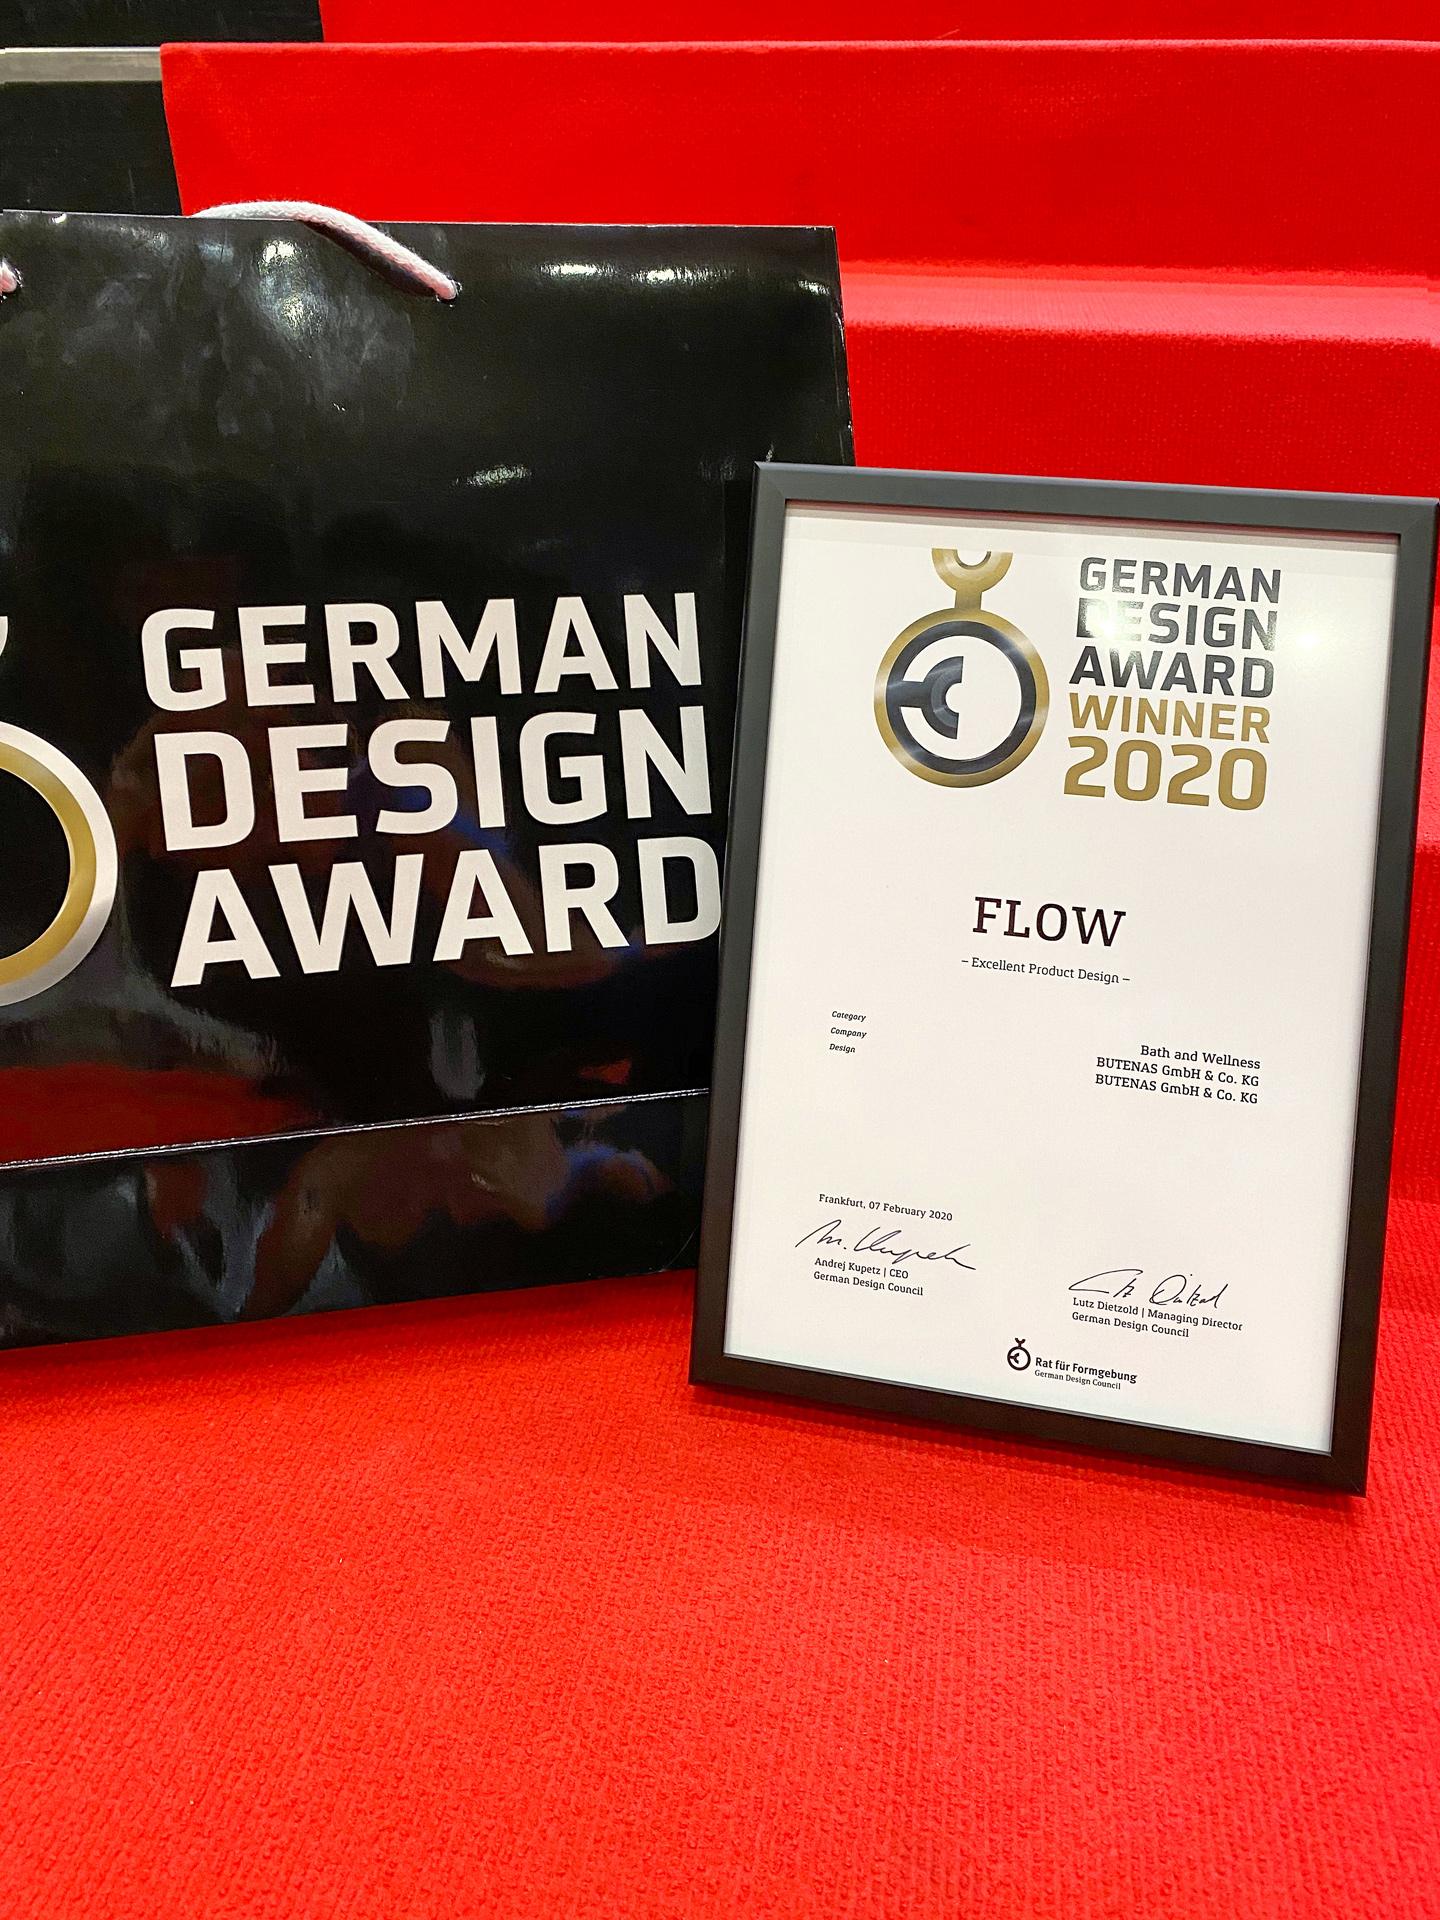 BUTENAS Urkunde German Design Award 2020